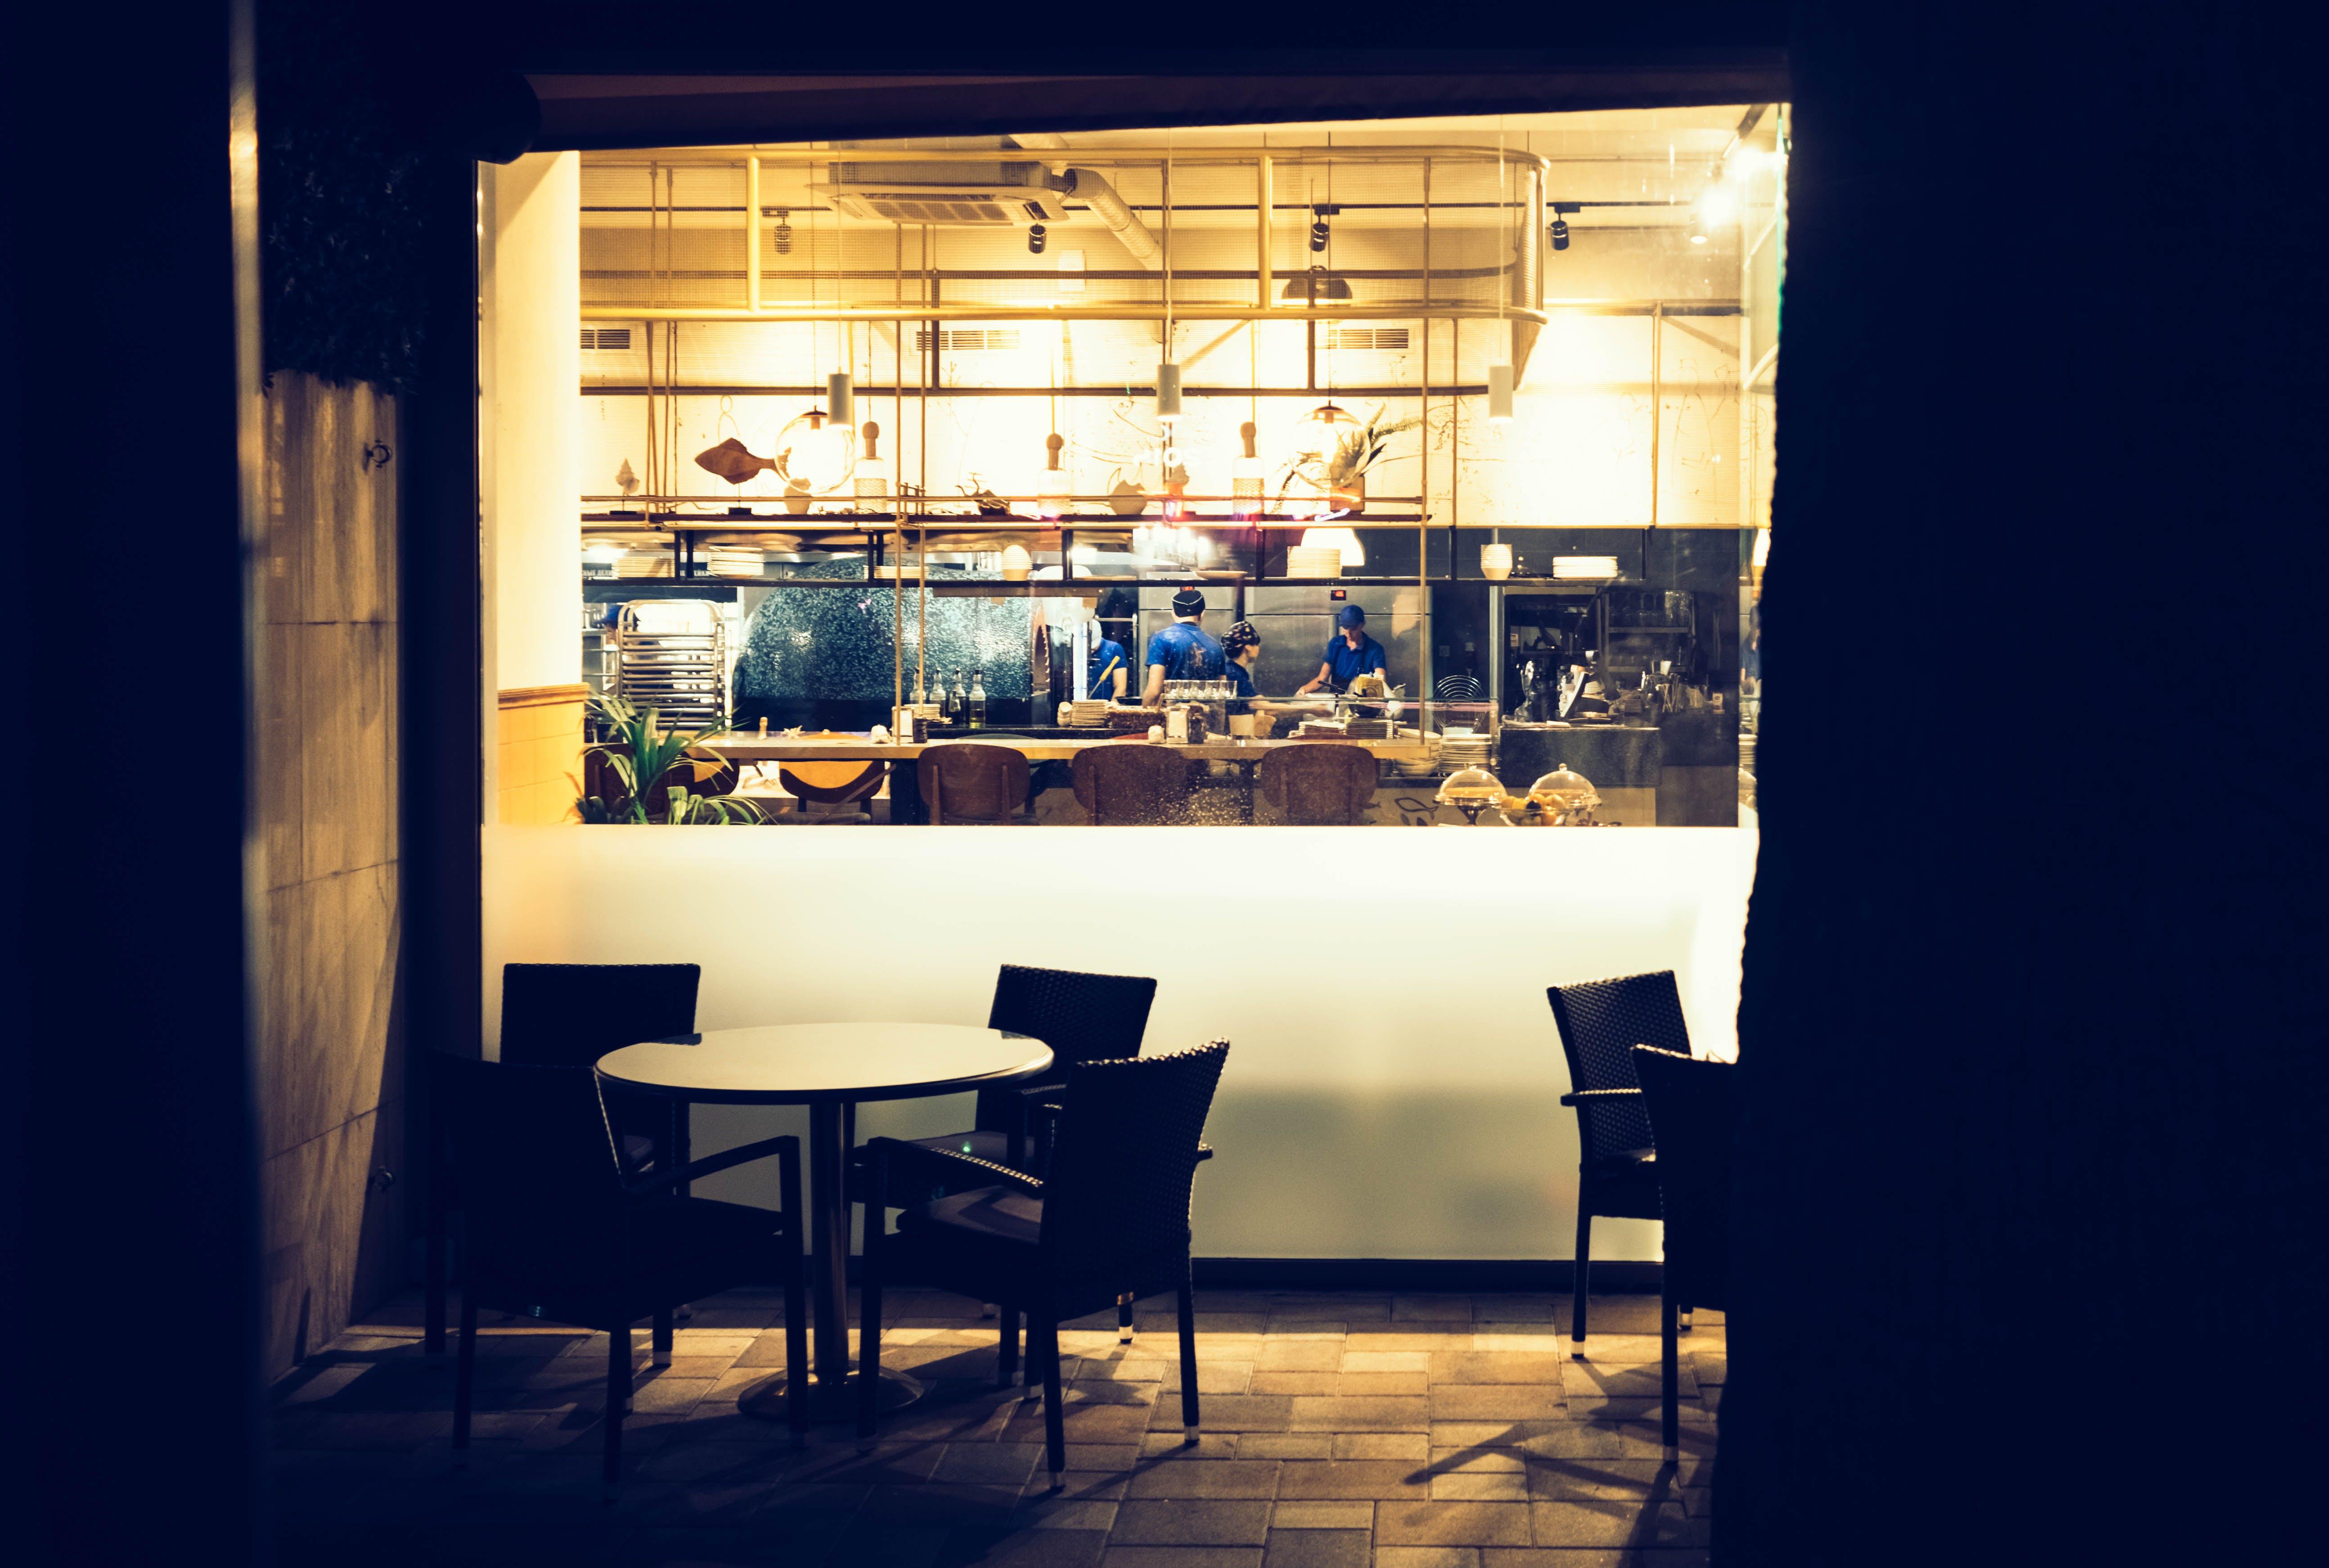 Kostenloses Stock Foto zu restaurant, menschen, beleuchtung, café